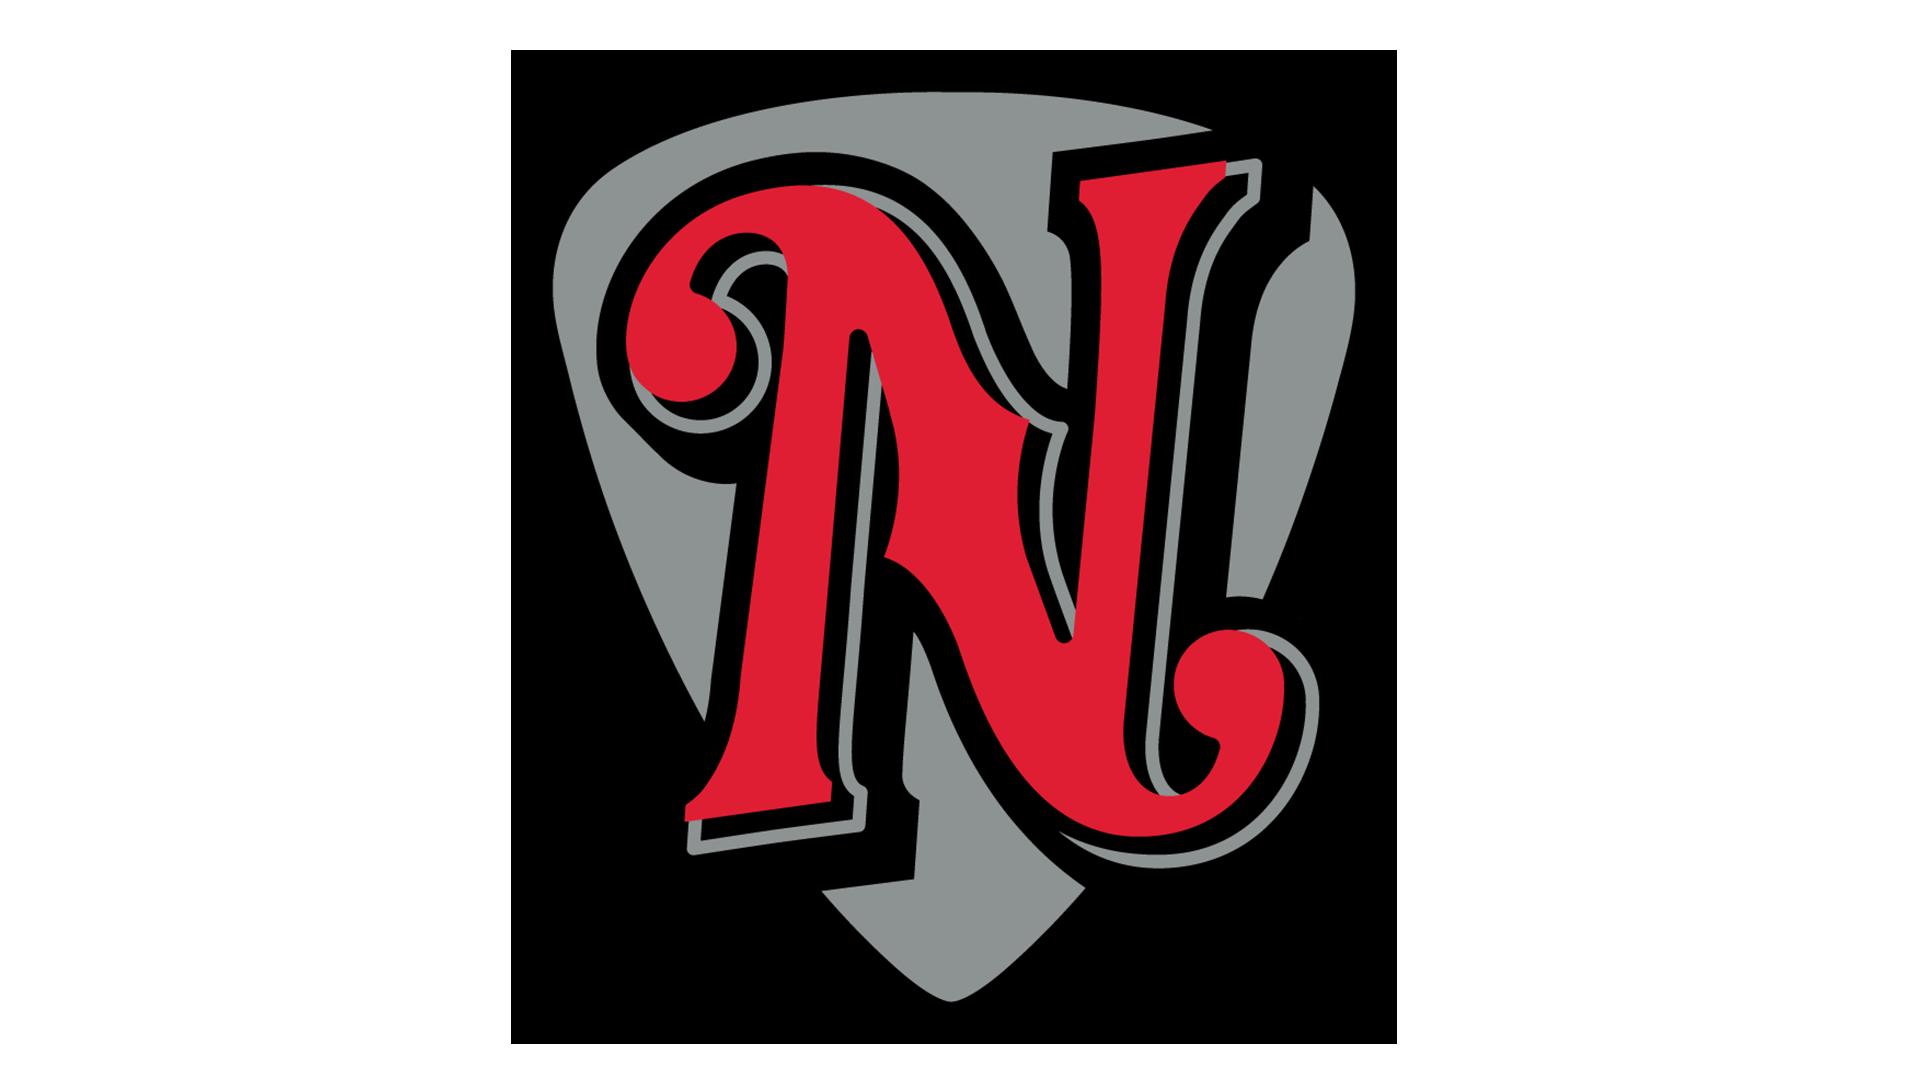 Meaning Nashville Sounds logo and symbol.